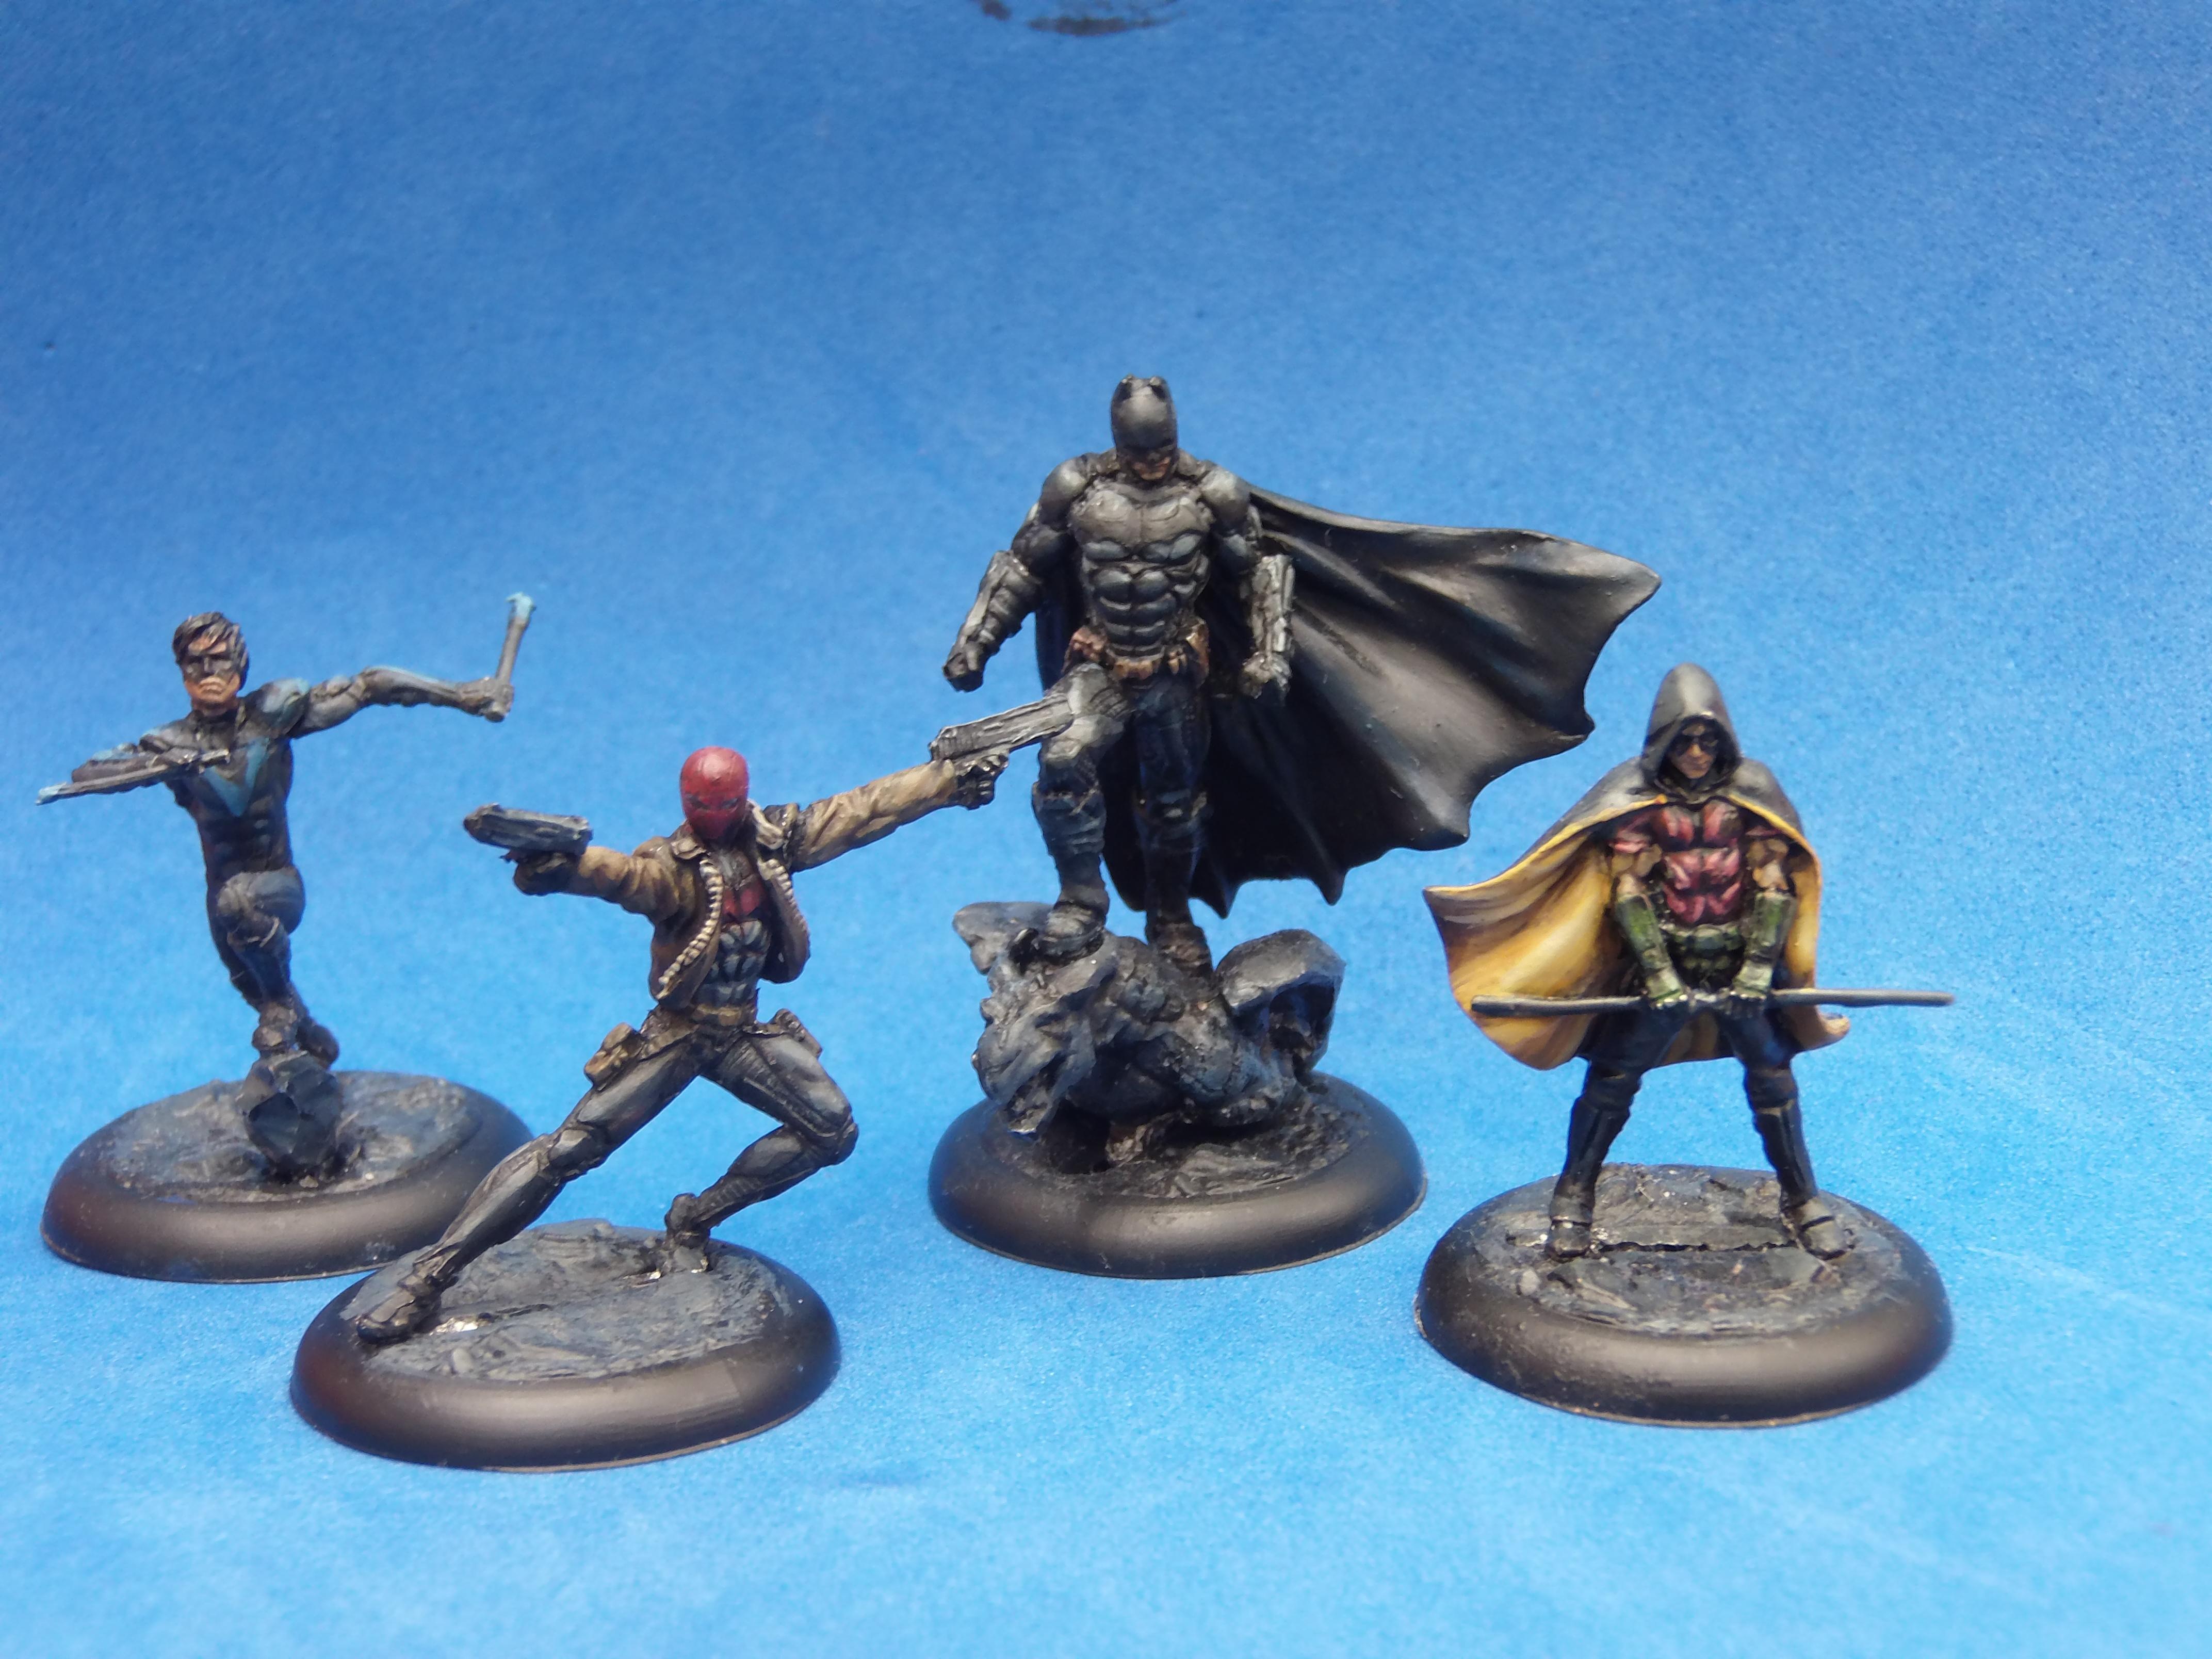 Batman, Dc, Nightwing, Red Hood, Robin, Superhero